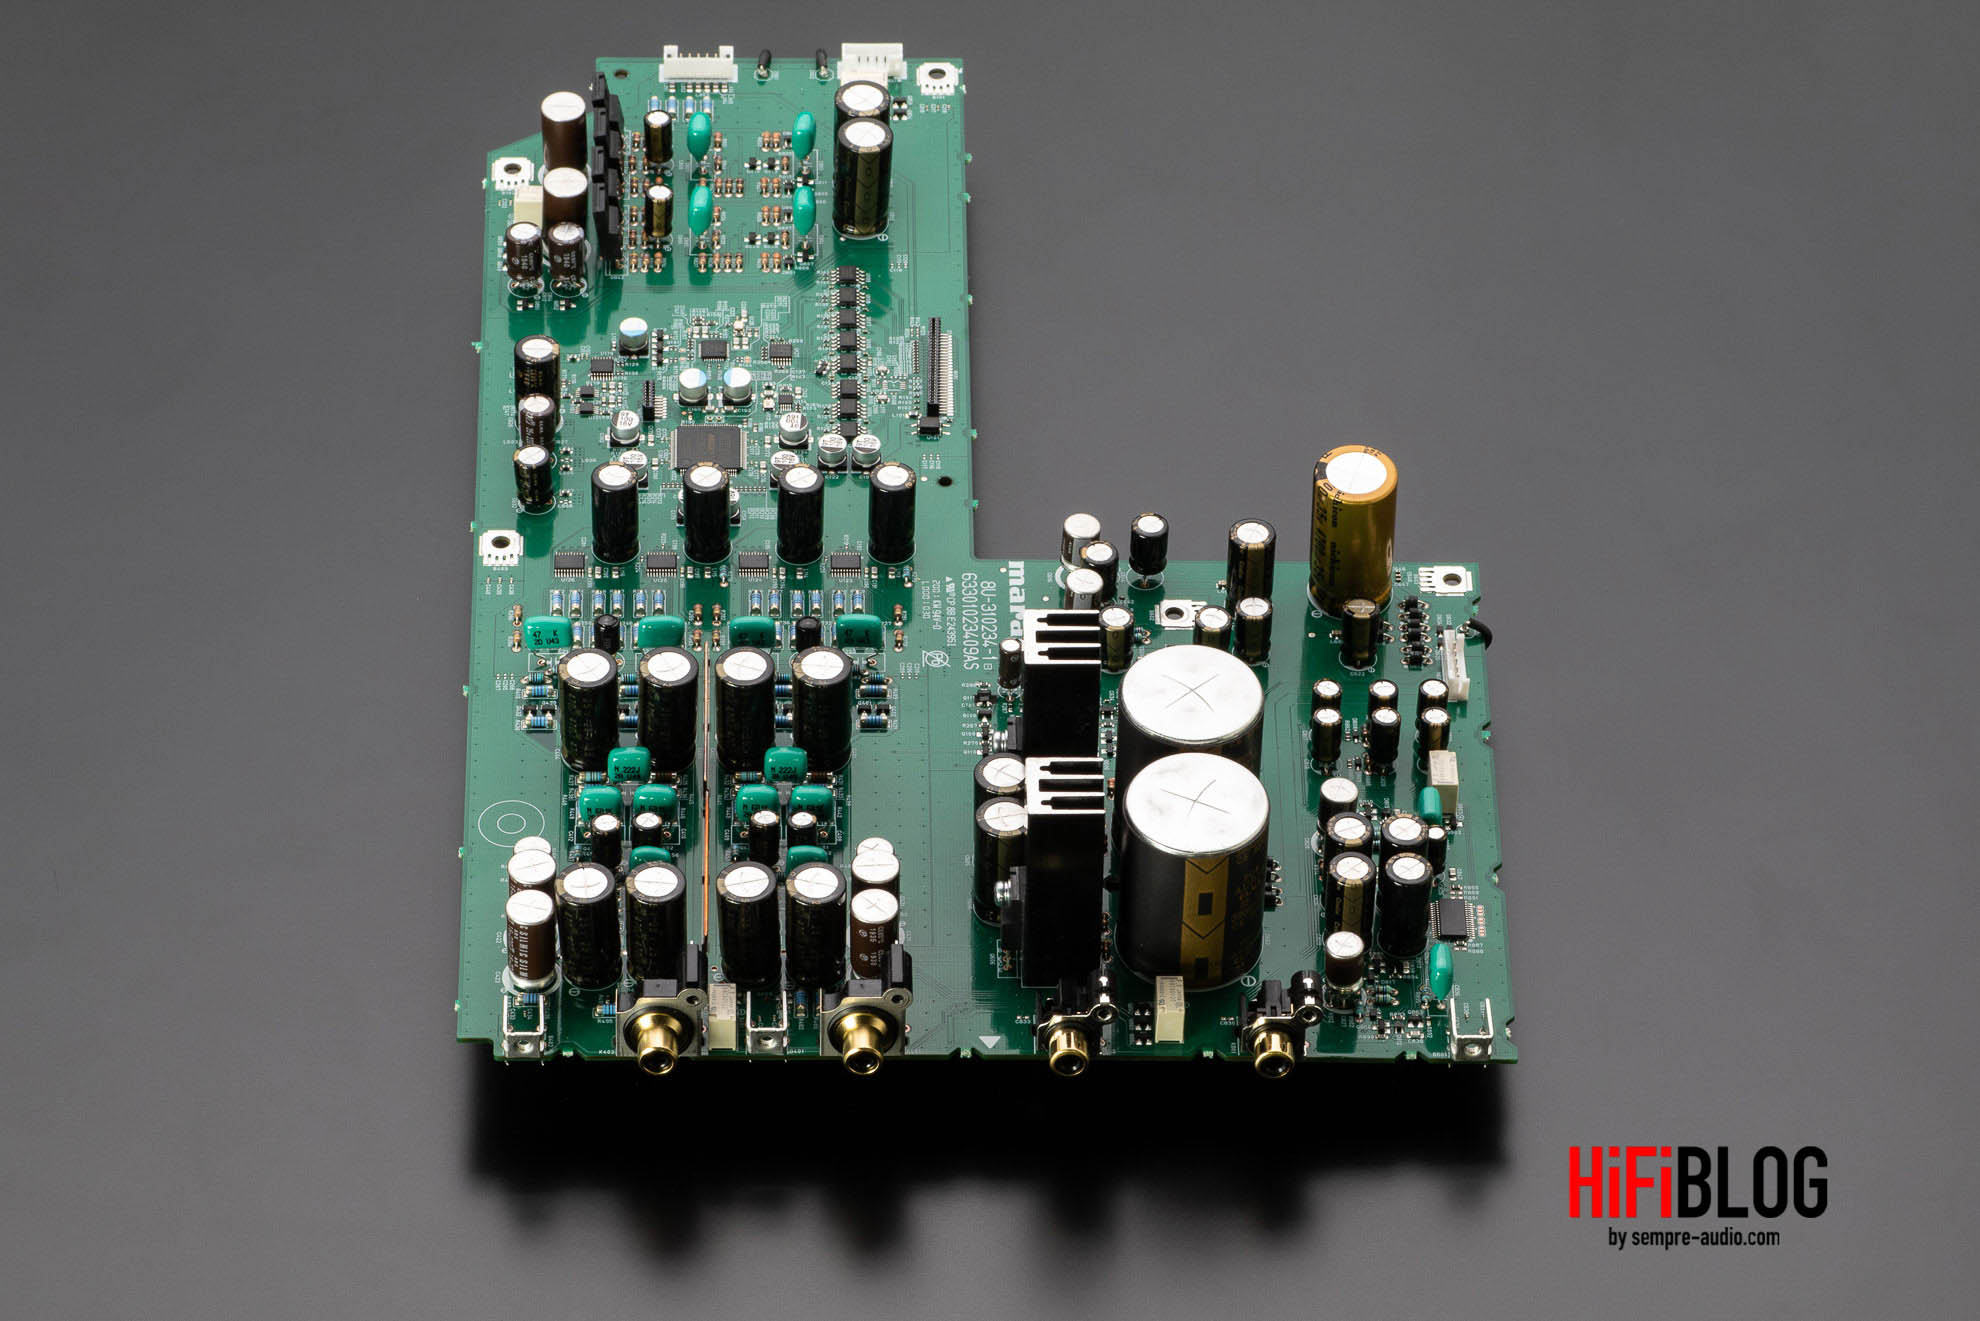 Marantz Model 30 Integrated Amplifier and SACD 30n Network SACD Player 62